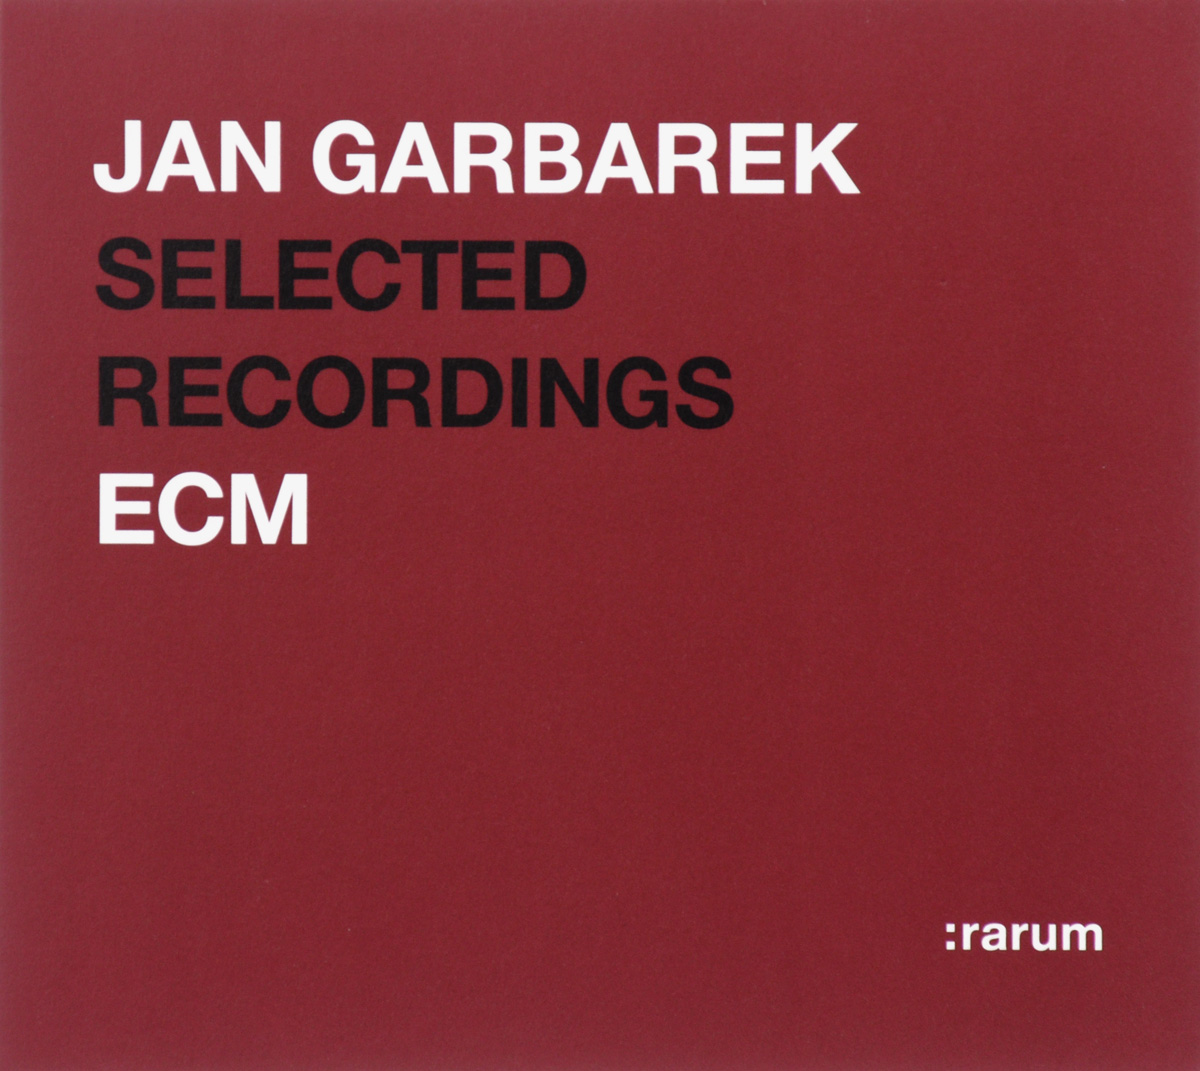 Ян Гарбарек Jan Garbarek. Selected Recordings (2 CD) недорого